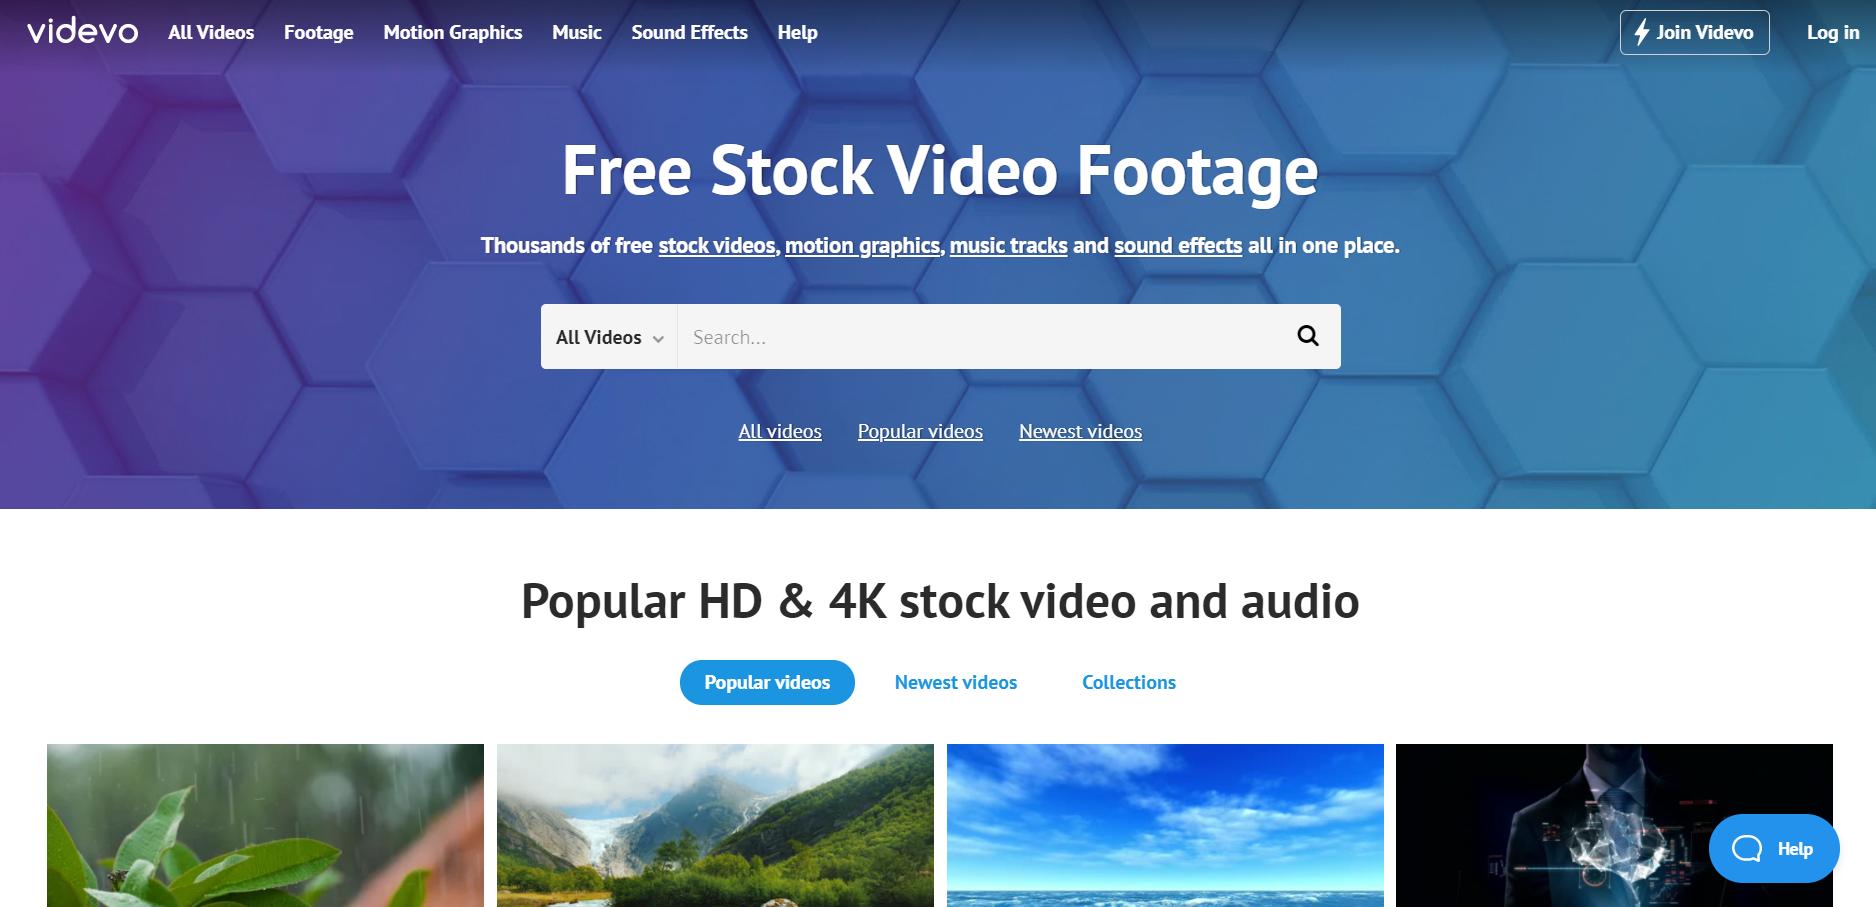 Free stock video platform Videvo